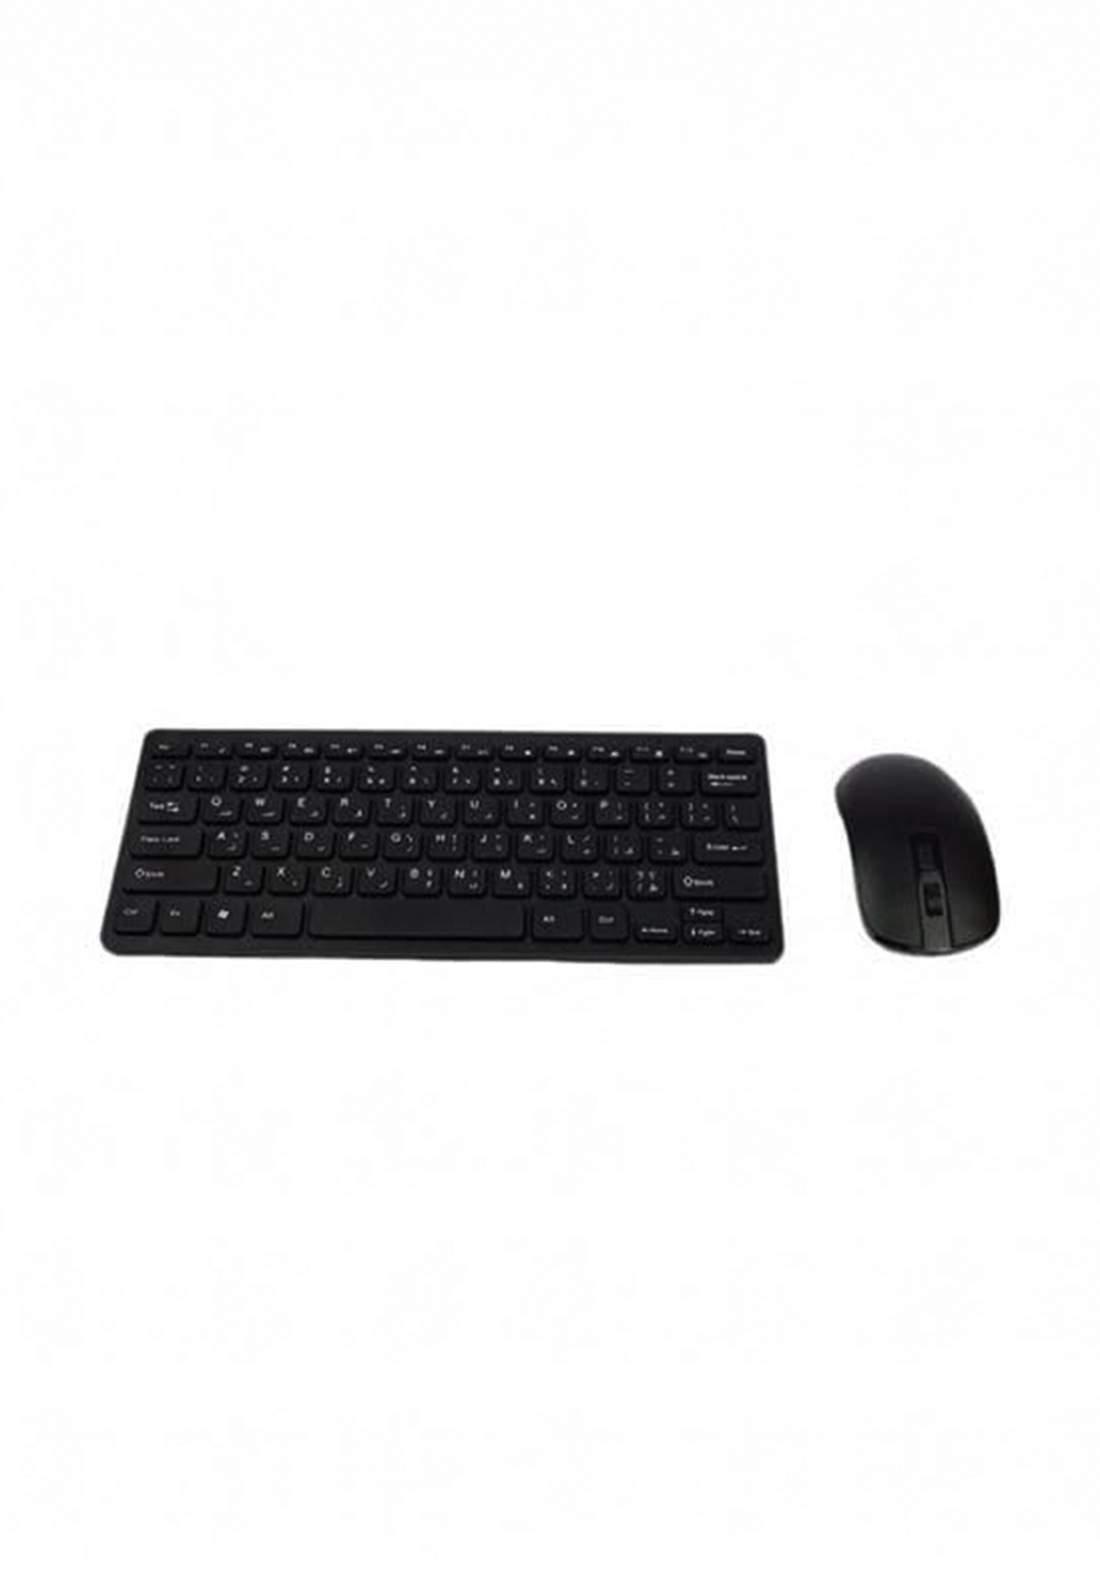 Mini KM901 Keaborad And Mouse Wireless-White لوحة مفاتيح وماوس